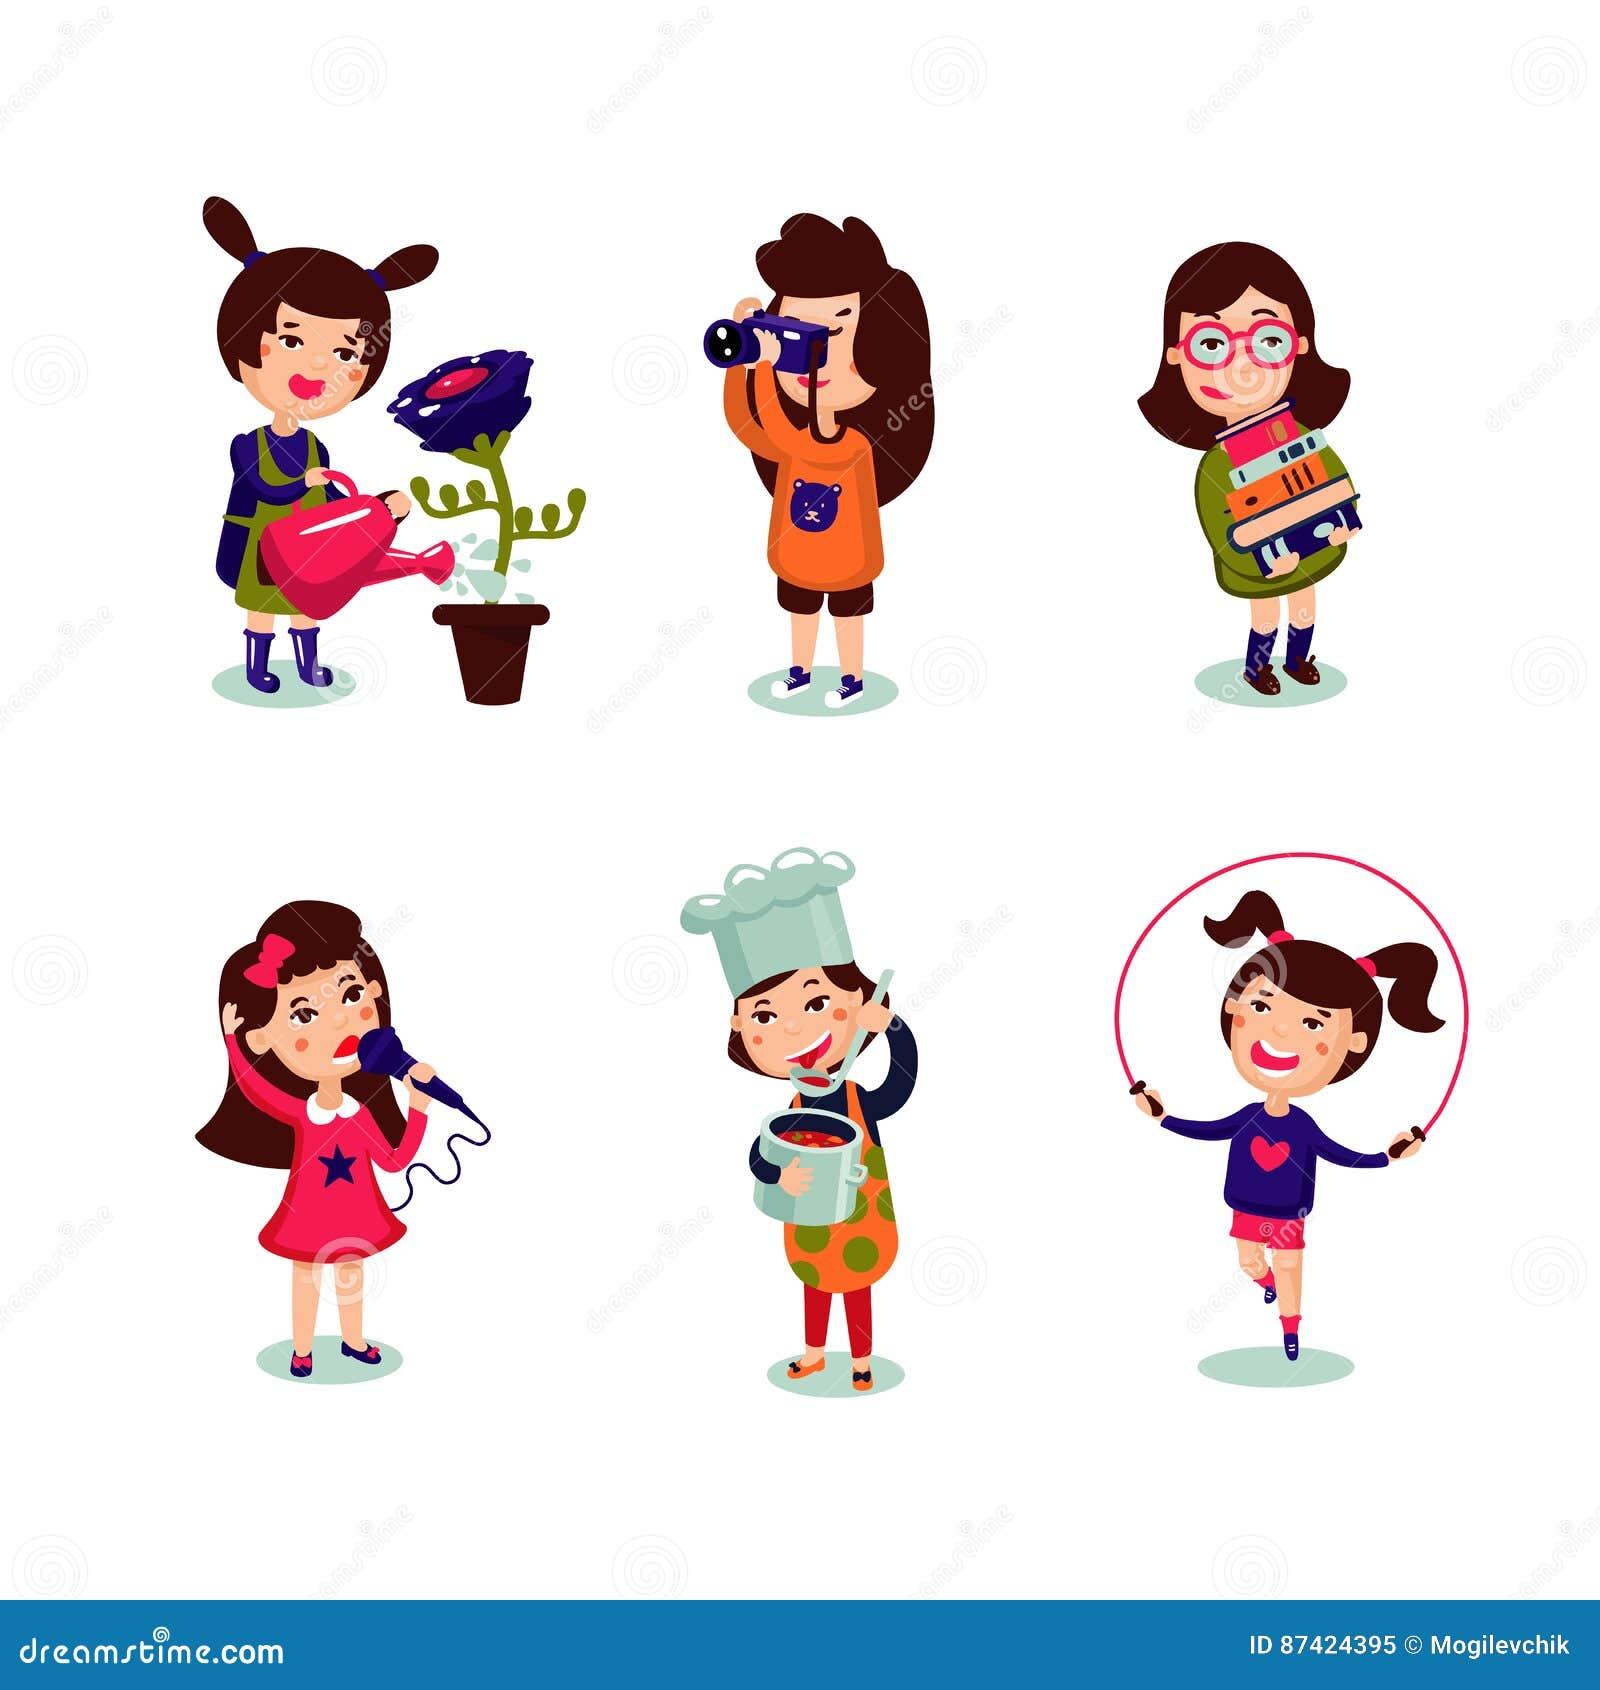 Hobbies of girls